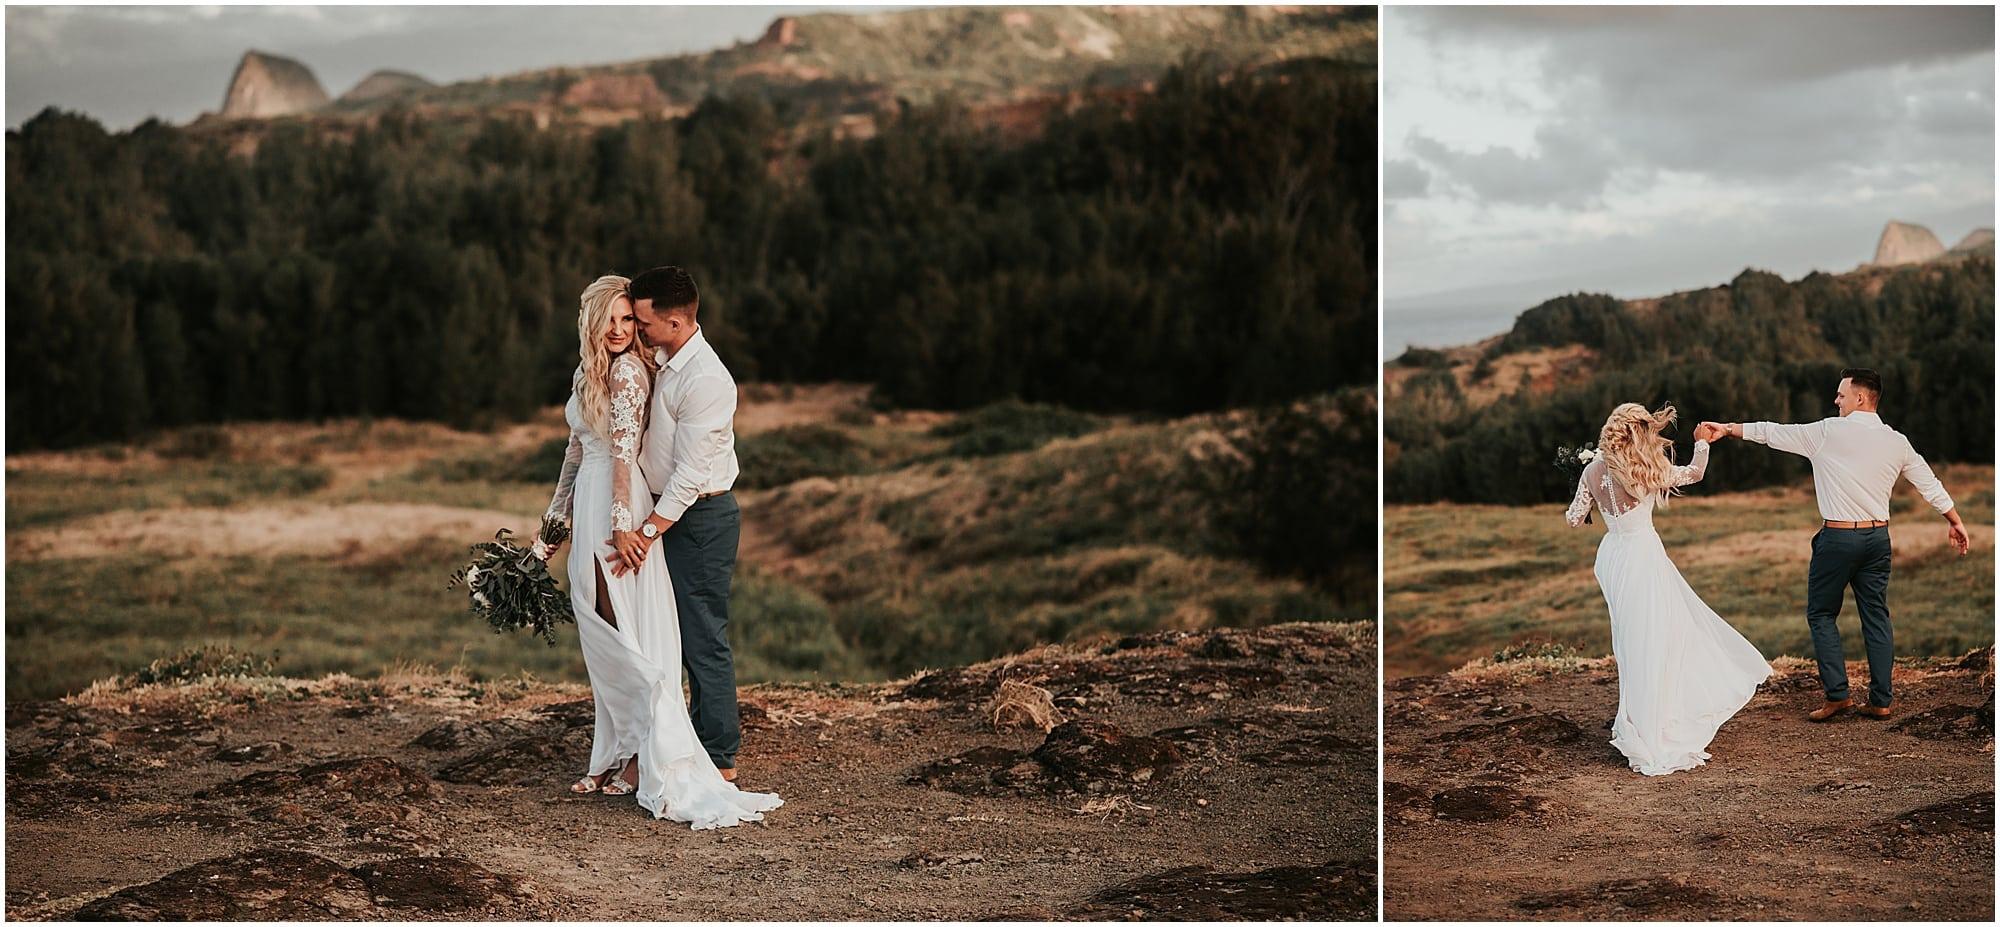 Maui wedding photographer33